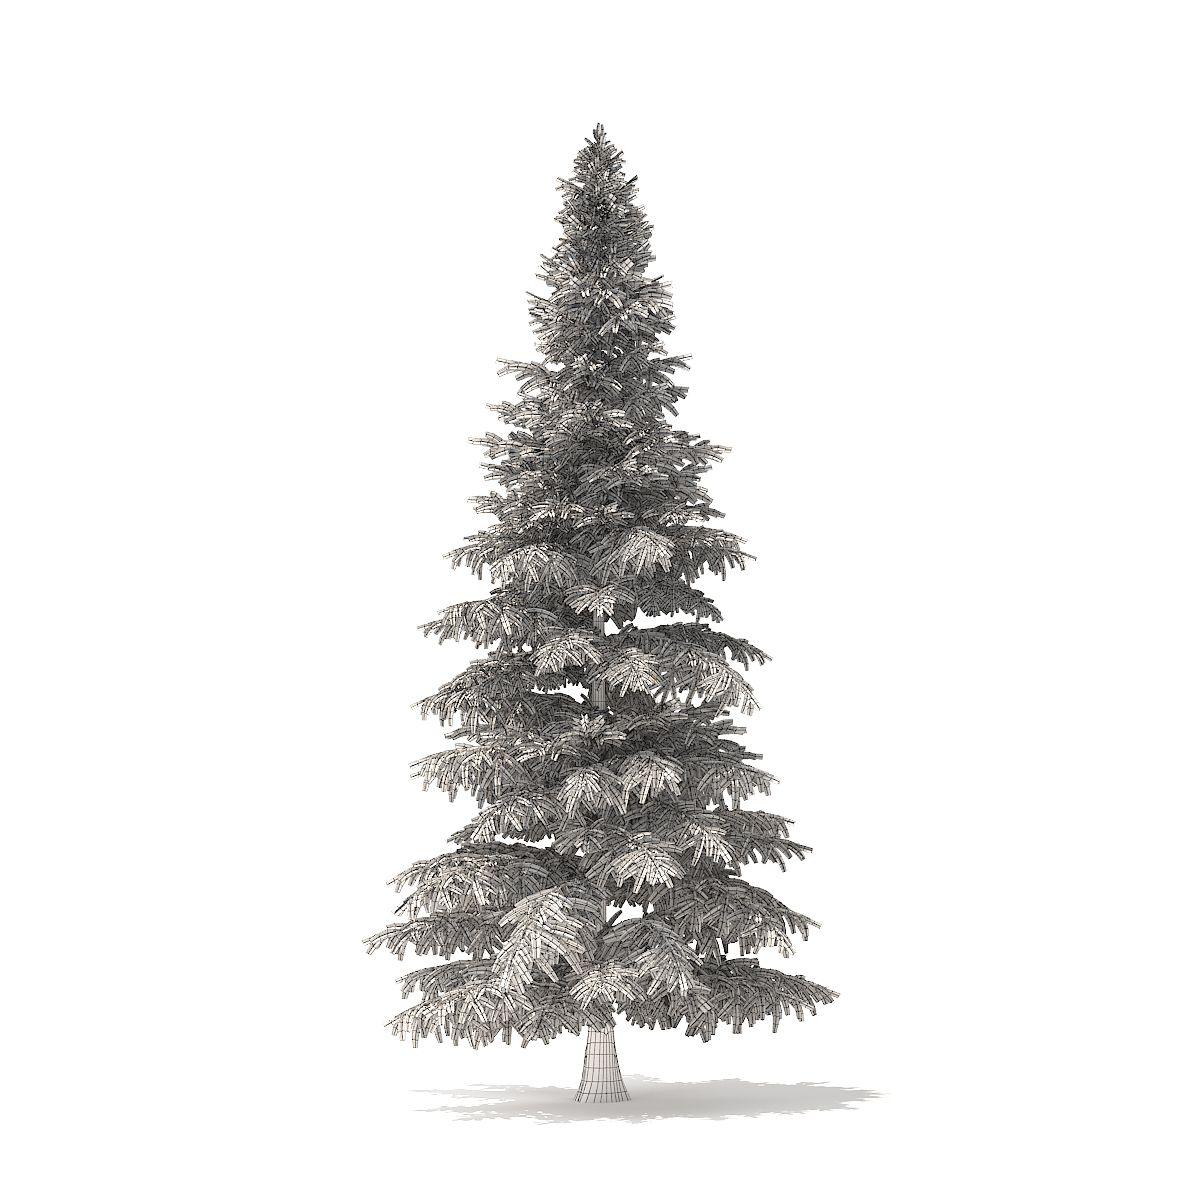 Spruce Tree 3d Model 8m Spruce Tree Model Spruce Tree Tree 3d Model